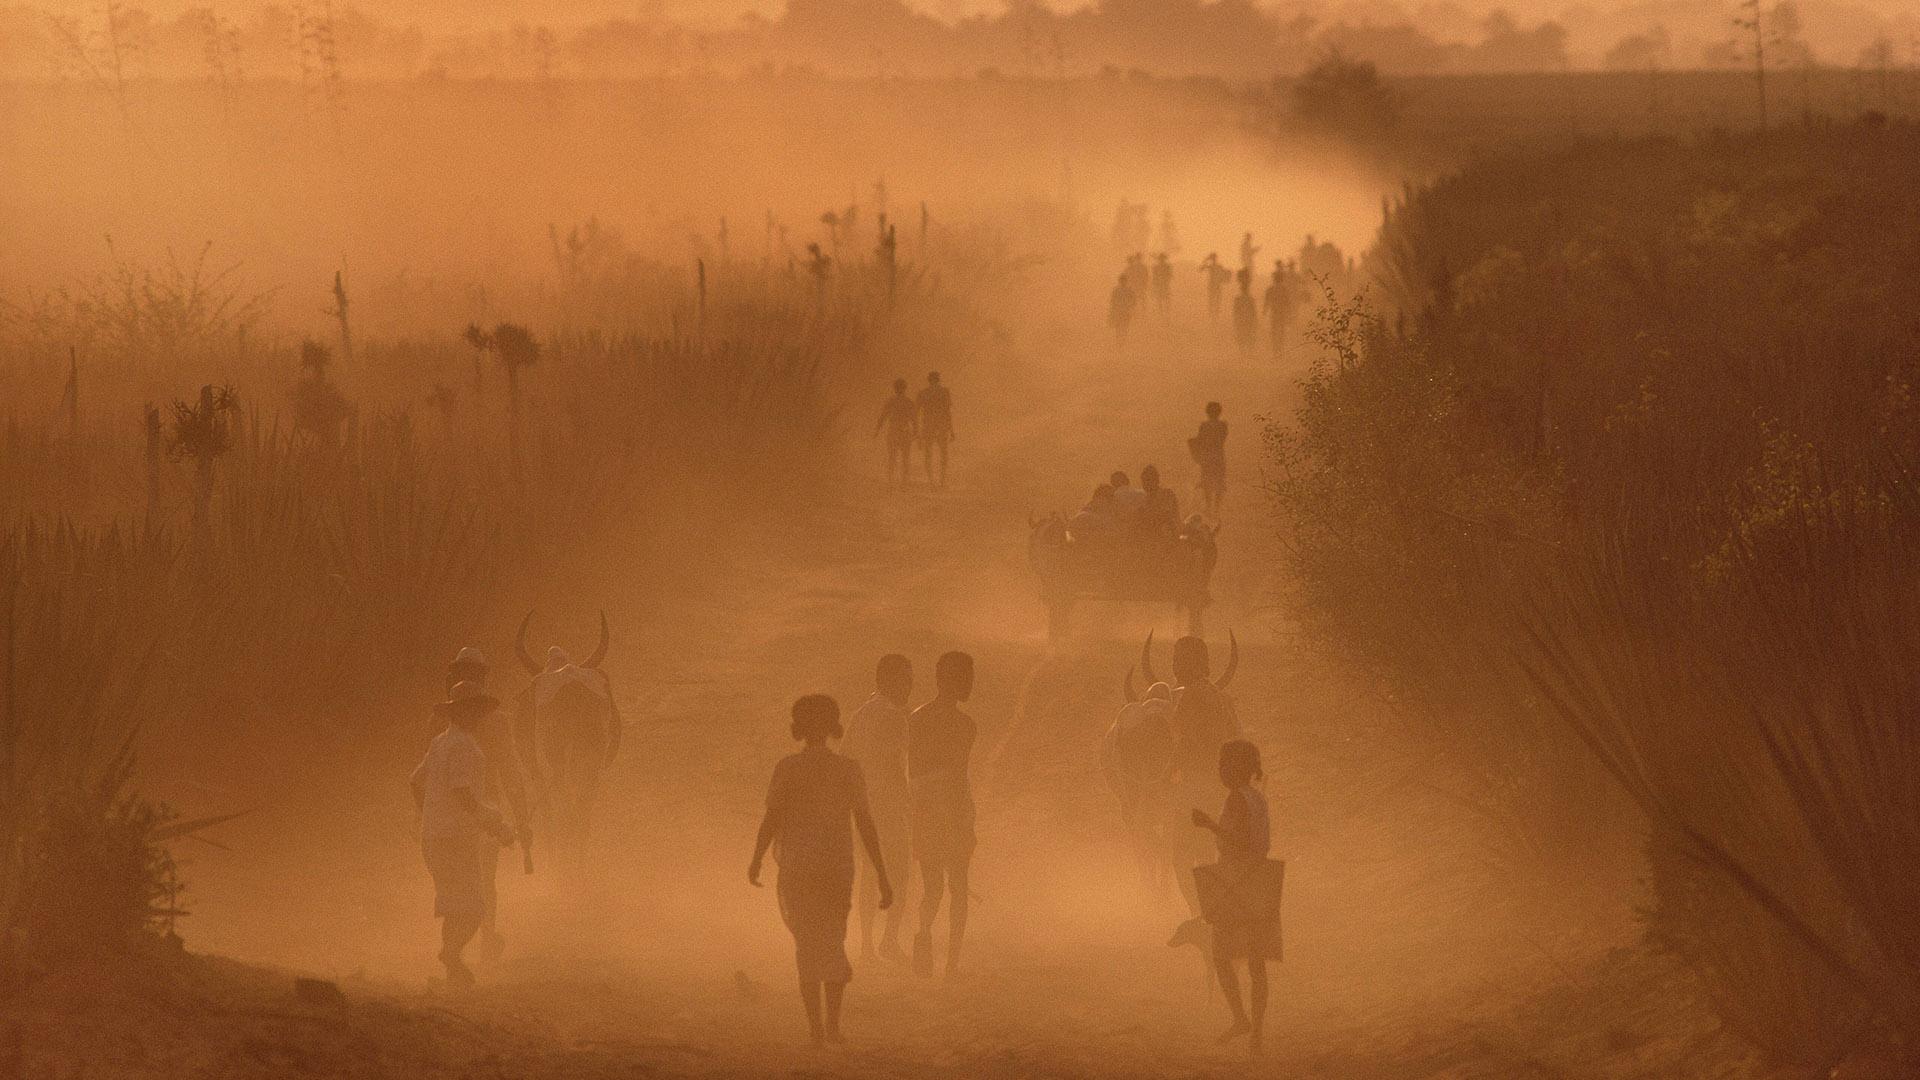 Madagaskar Staub Klimakrise Hunger